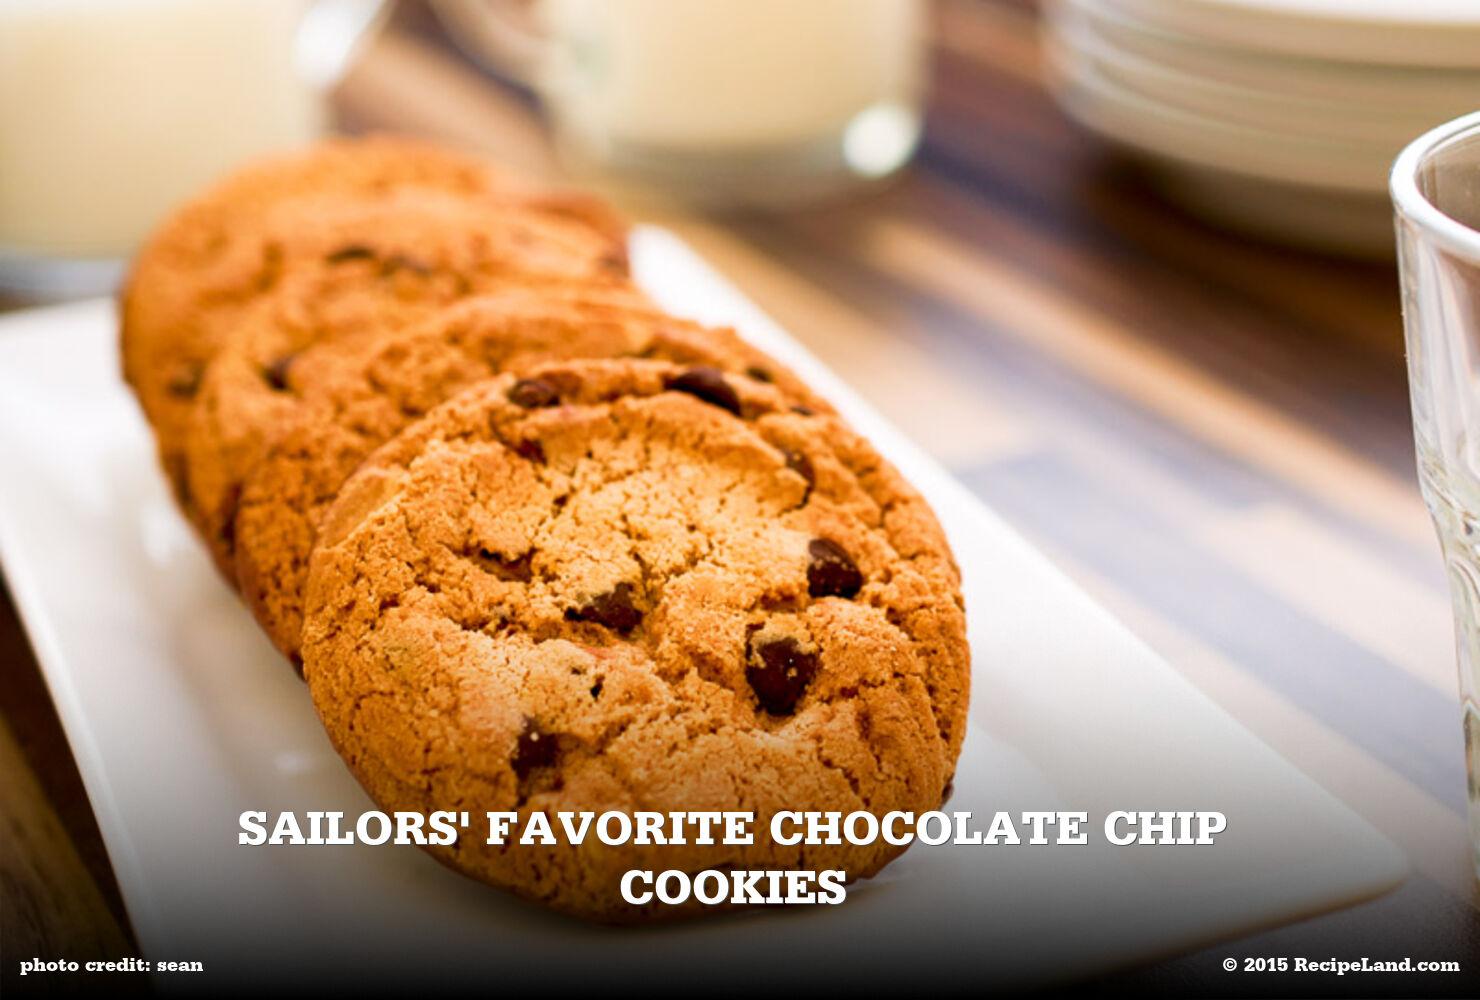 Sailors' Favorite Chocolate Chip Cookies